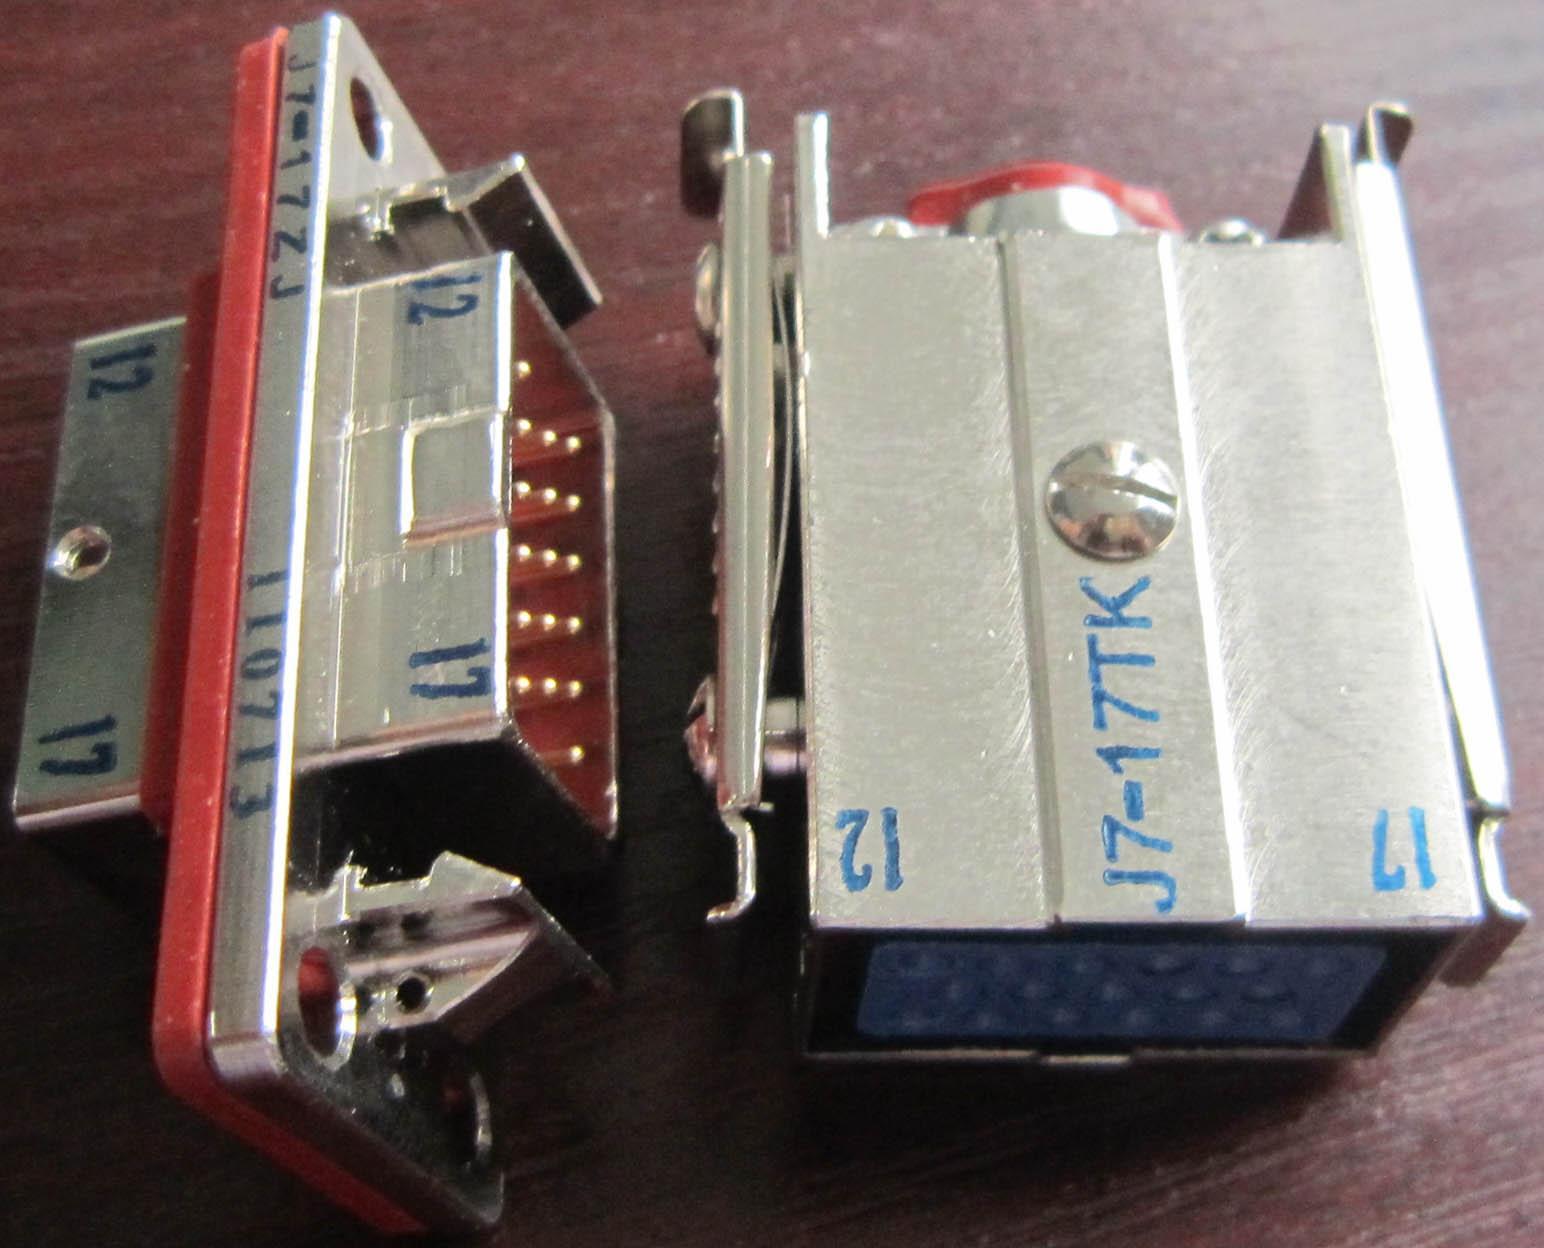 J7 series for military applicationrectangular connectors 4